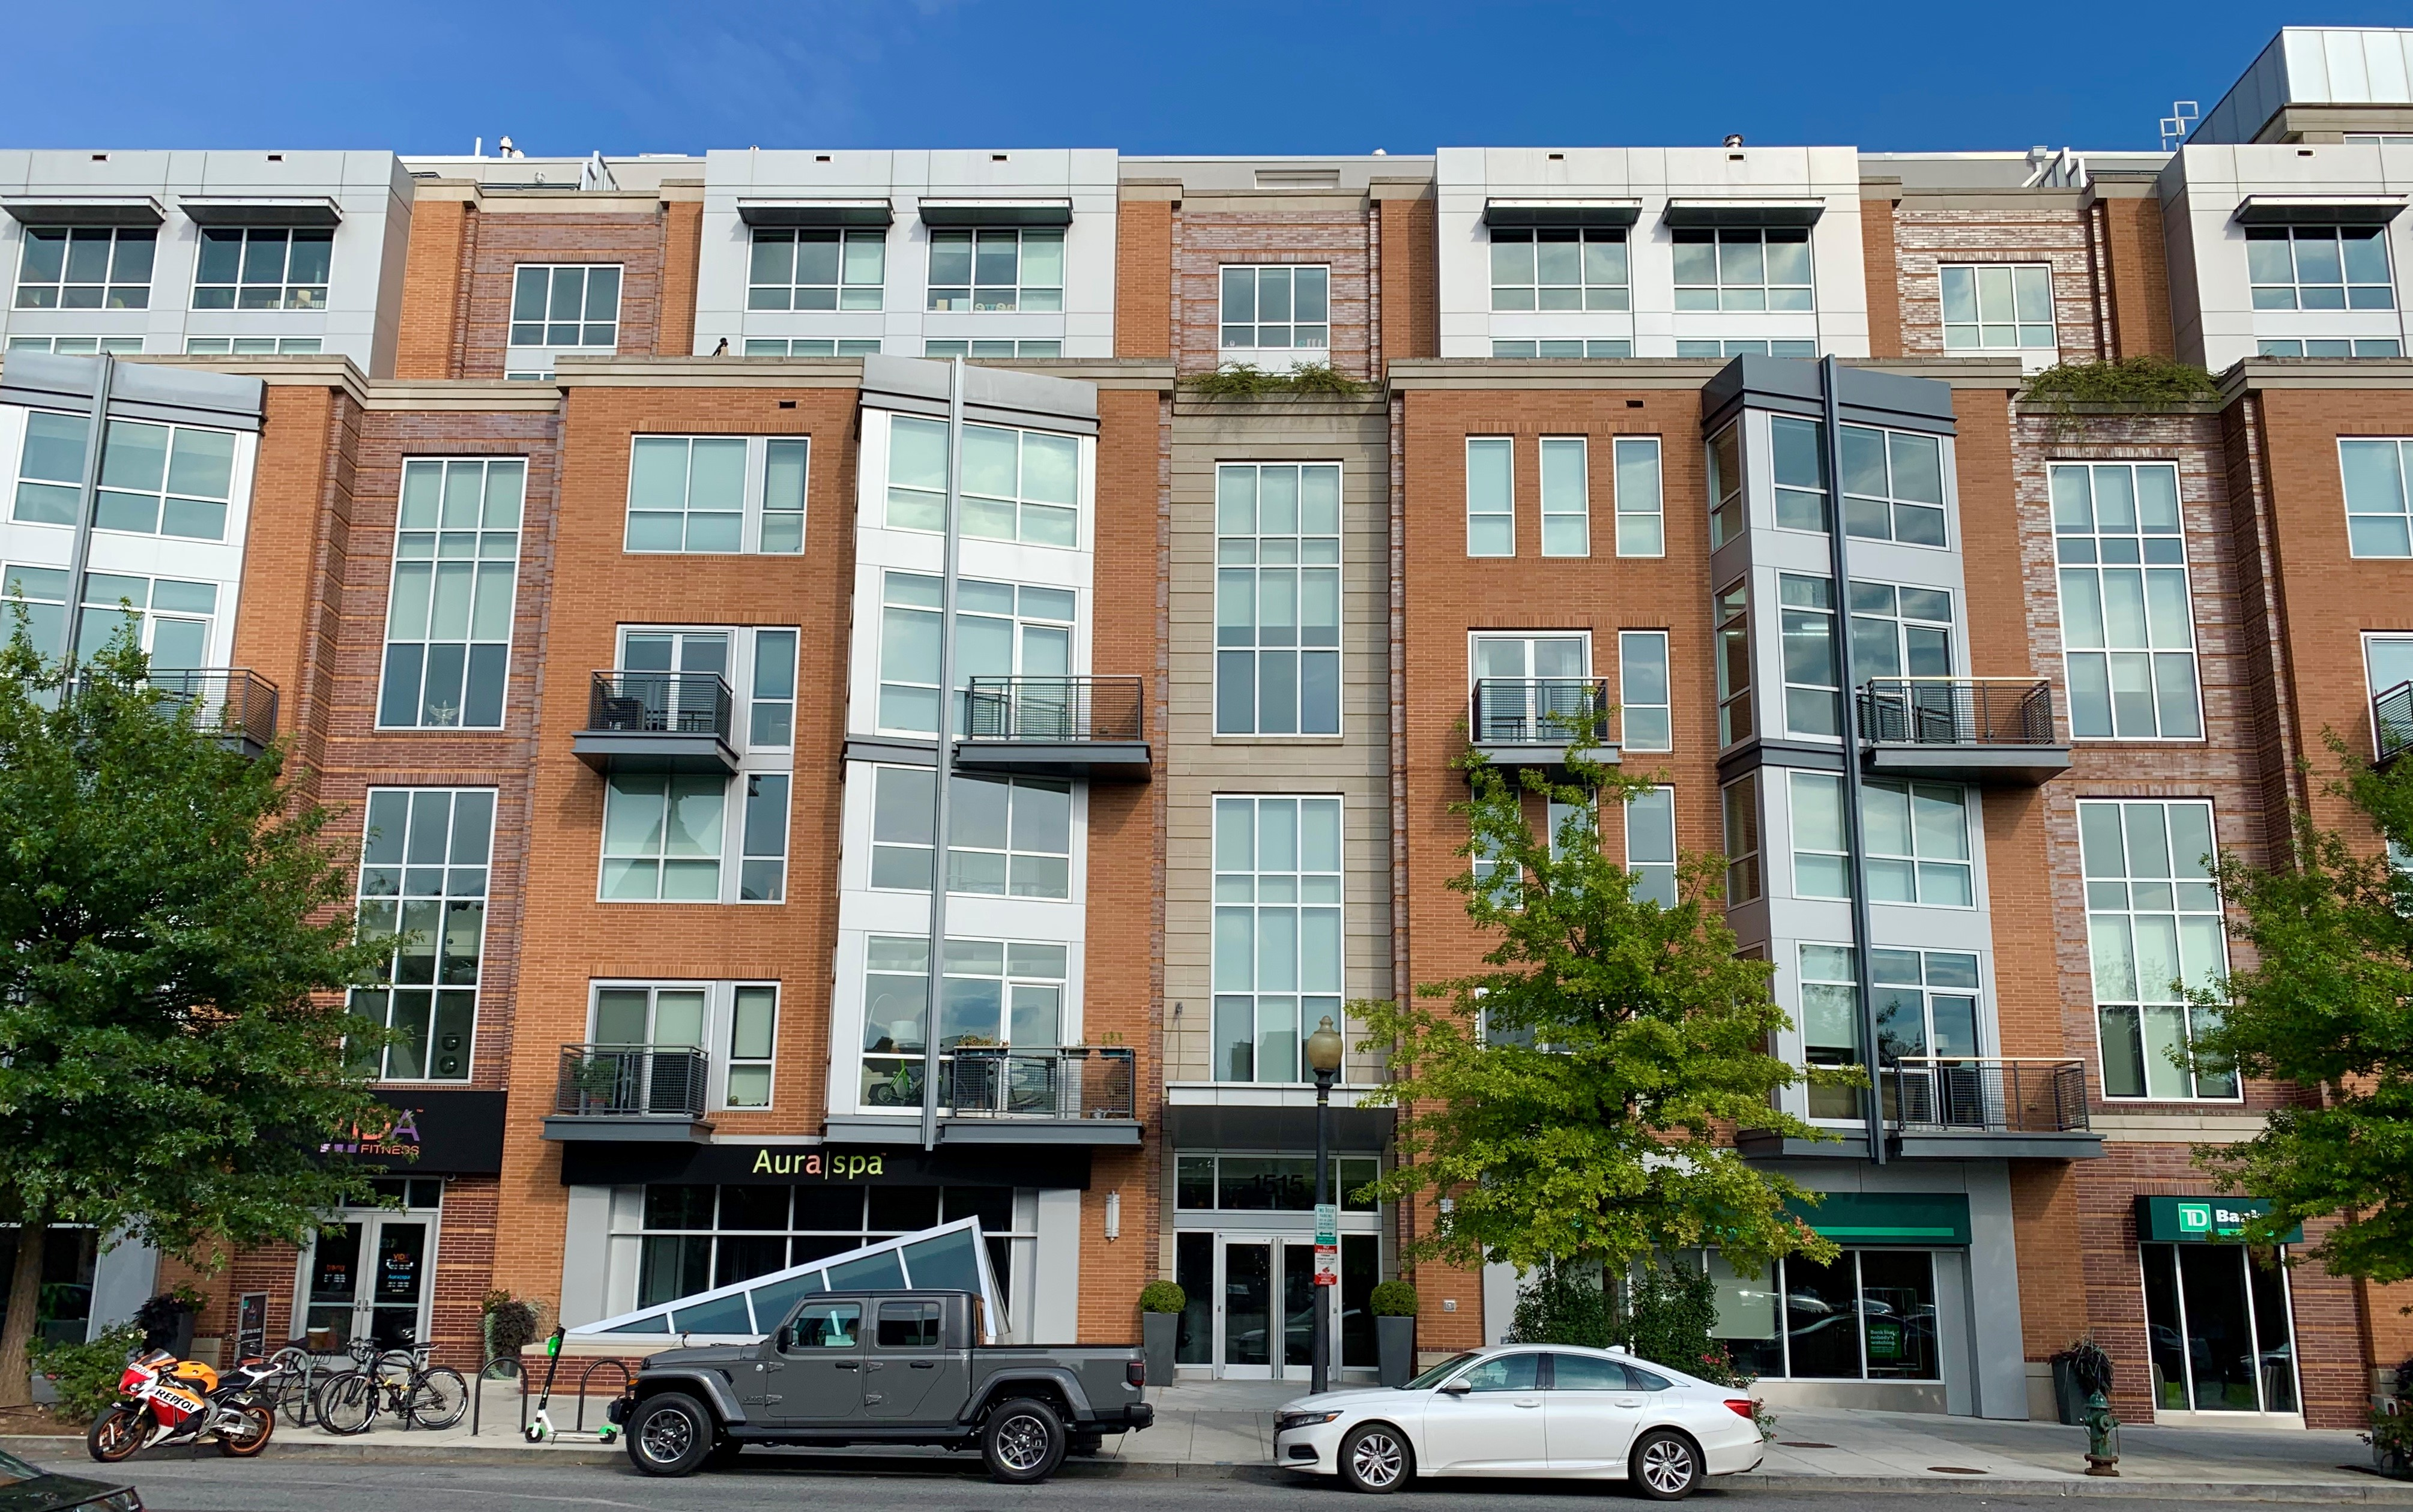 Washington, DC VA Condo Buildings & VA Approved Condos For Sale. The Metropole. Artyom Shmatko Realtor.